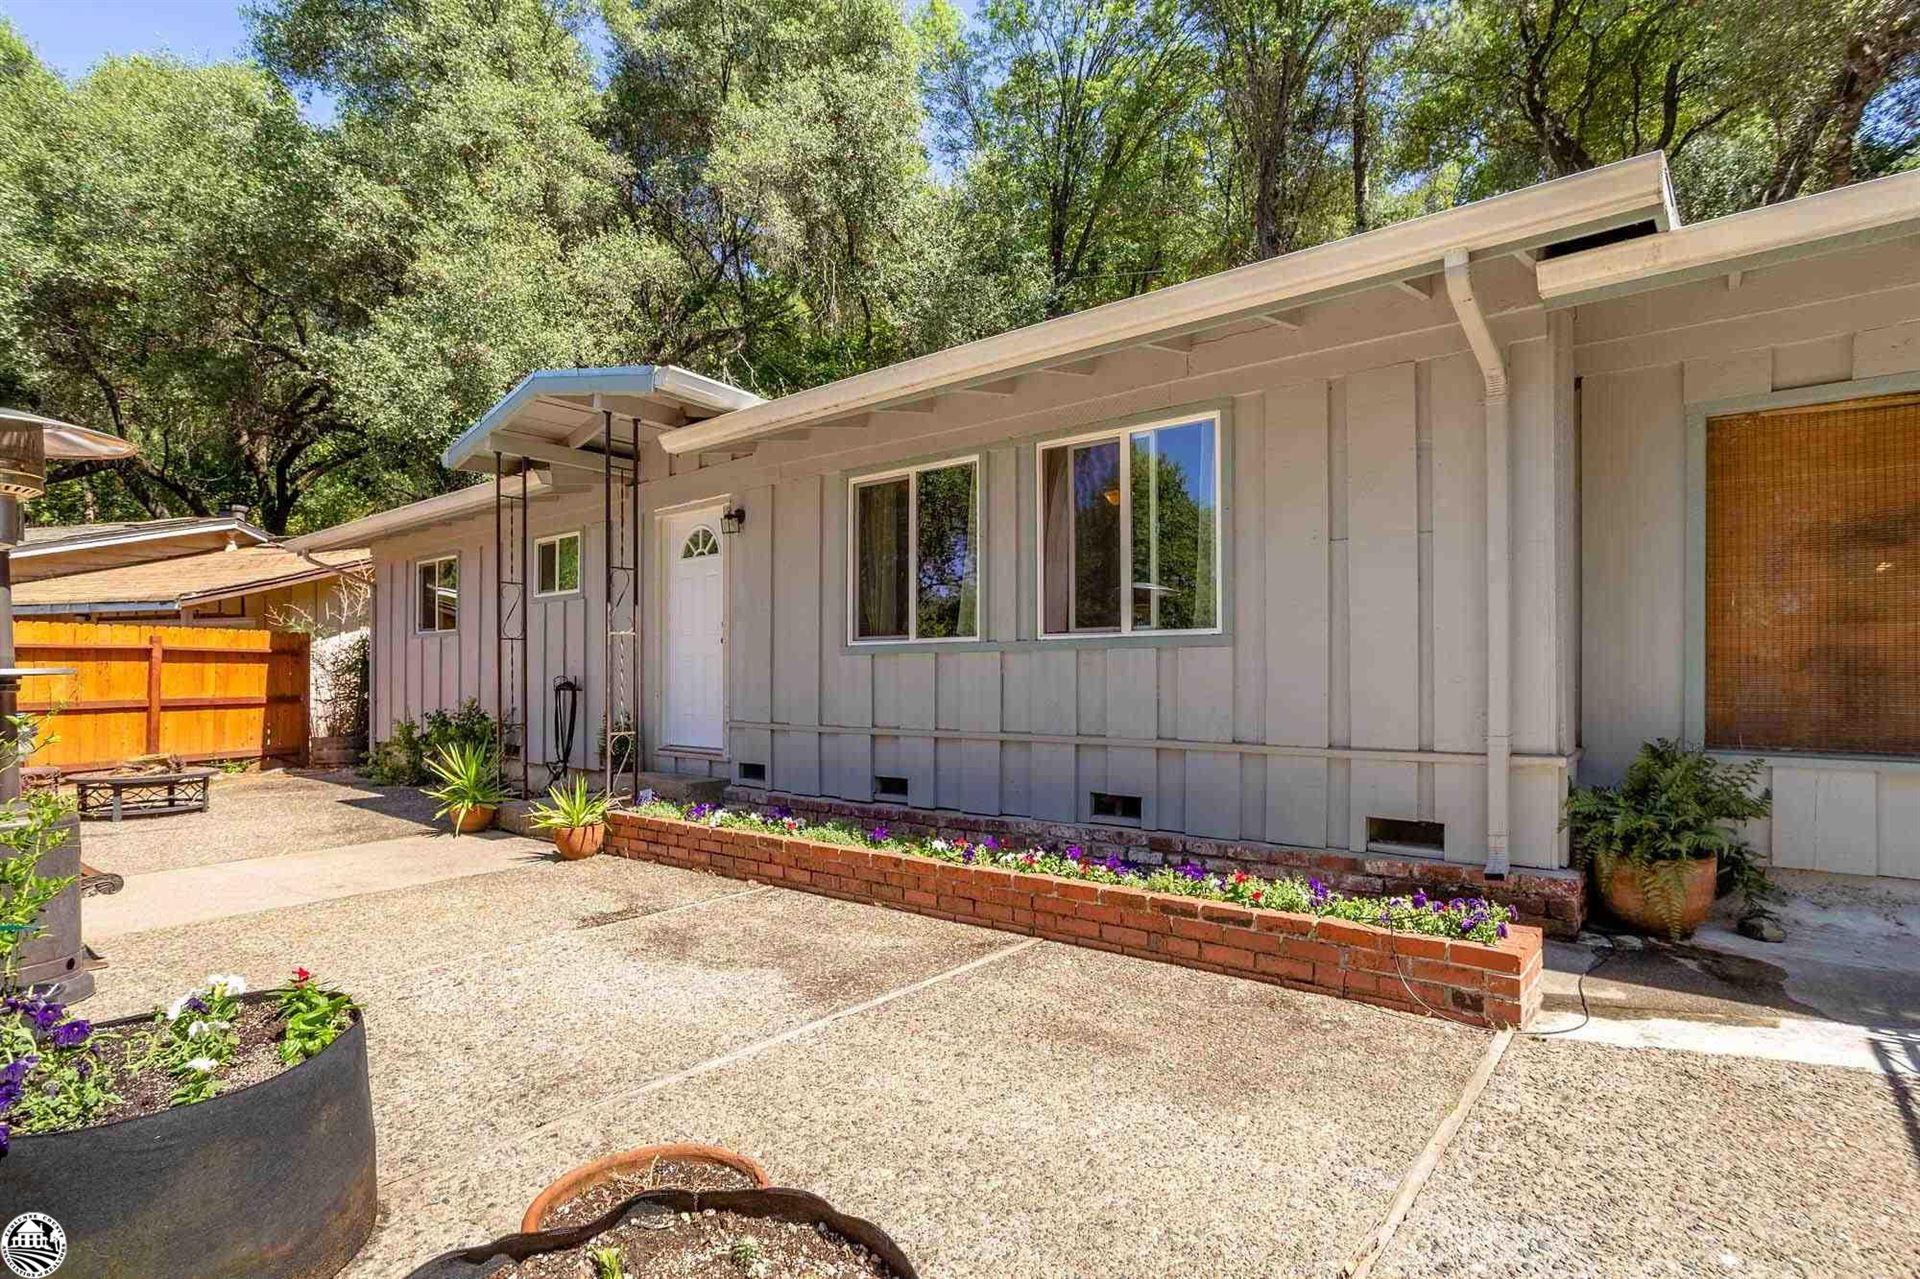 481 Southgate, Sonora, CA 95370 - MLS#: 20201002